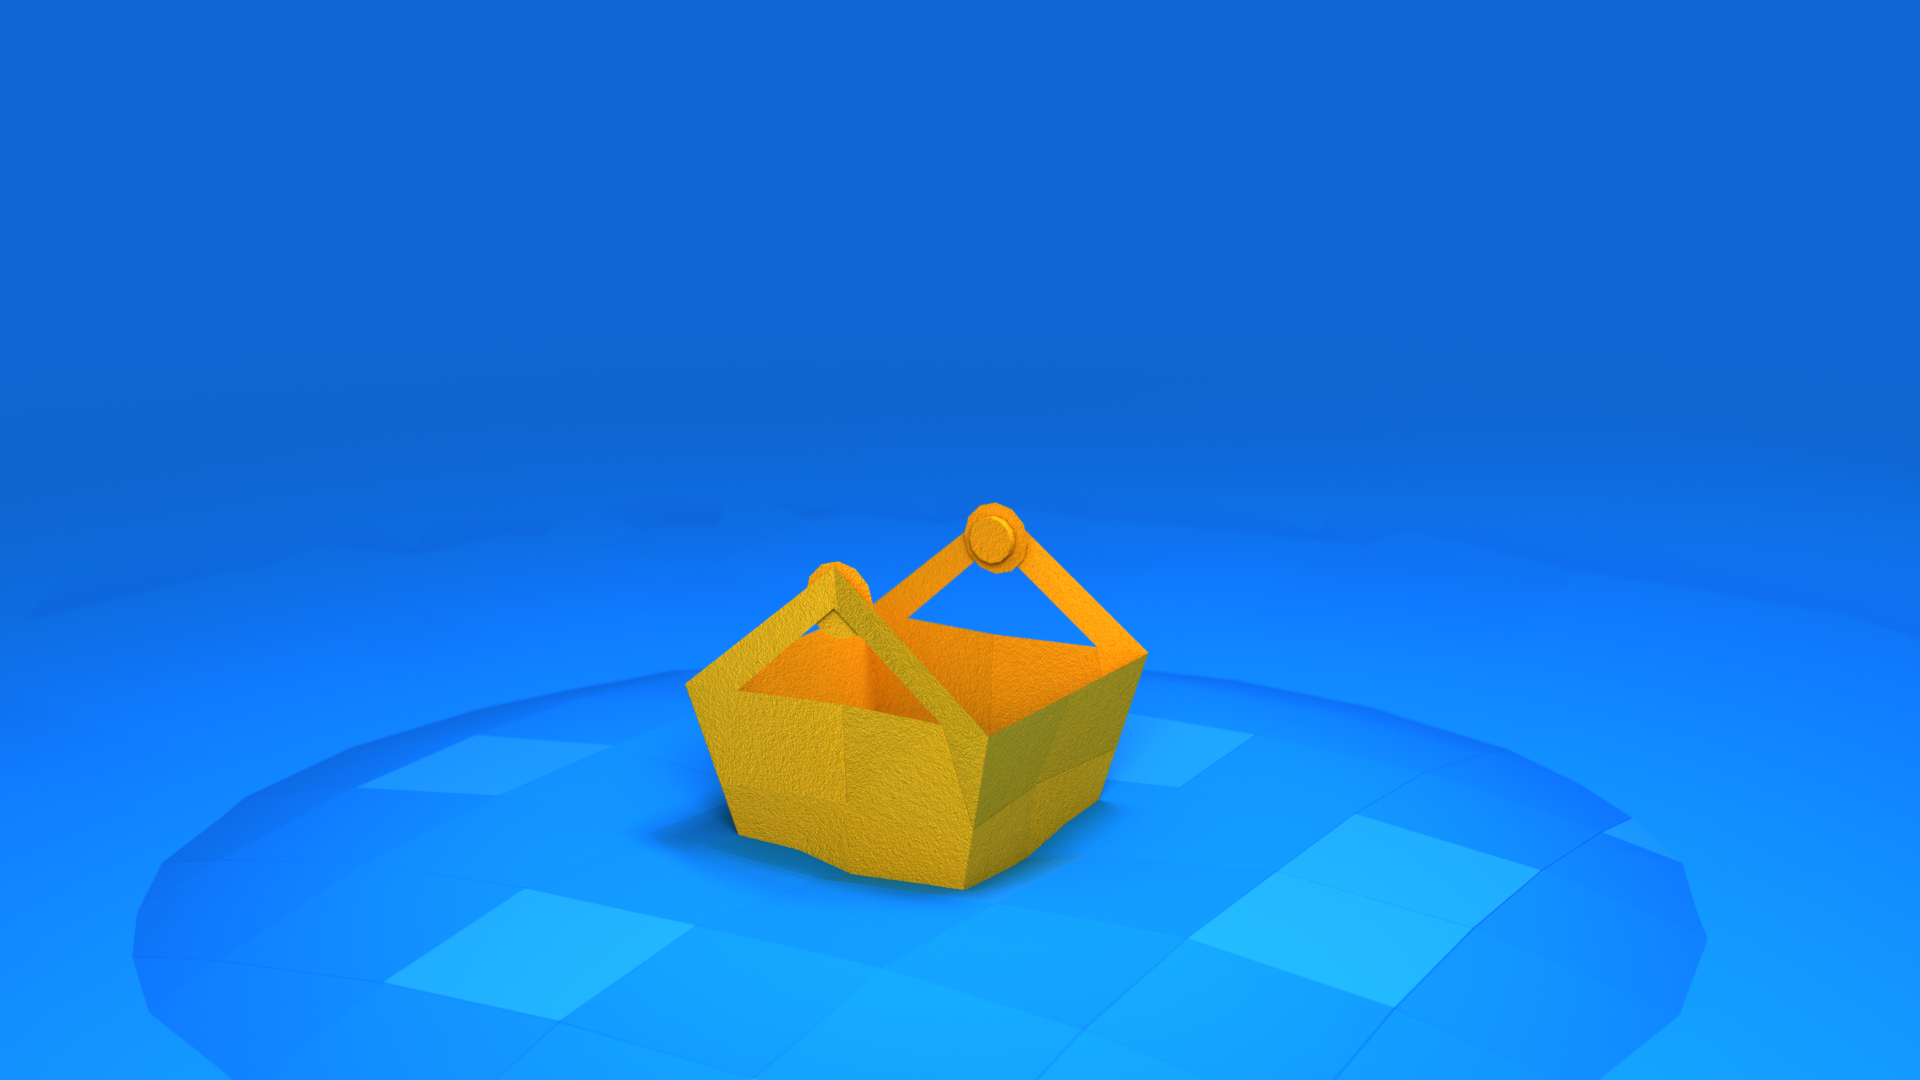 CartBoat_02_0020